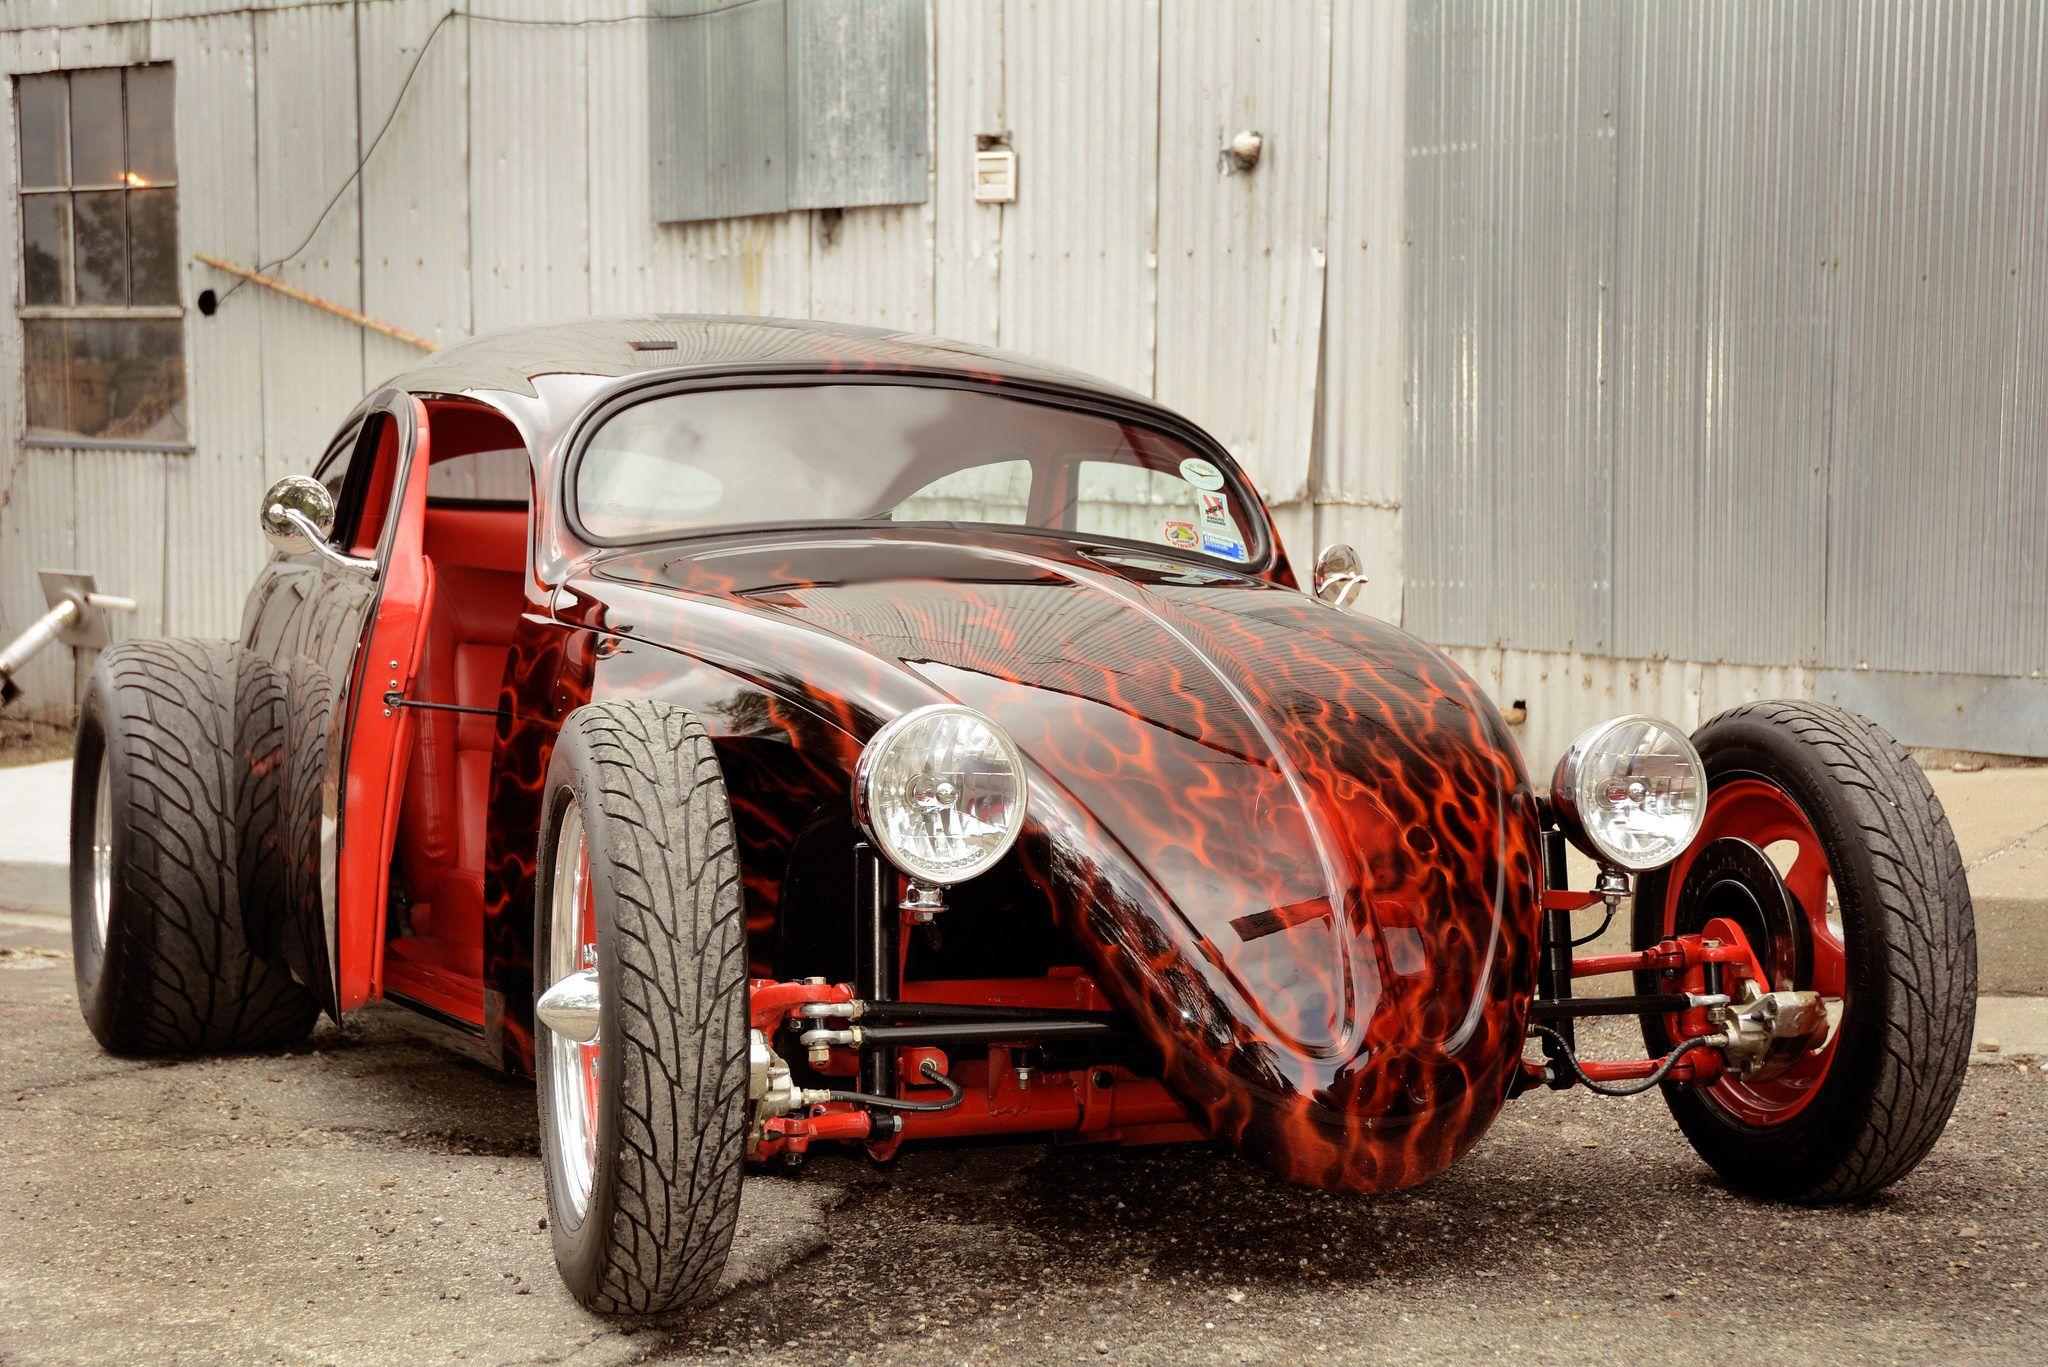 Hellbug - Vintage Customized VW